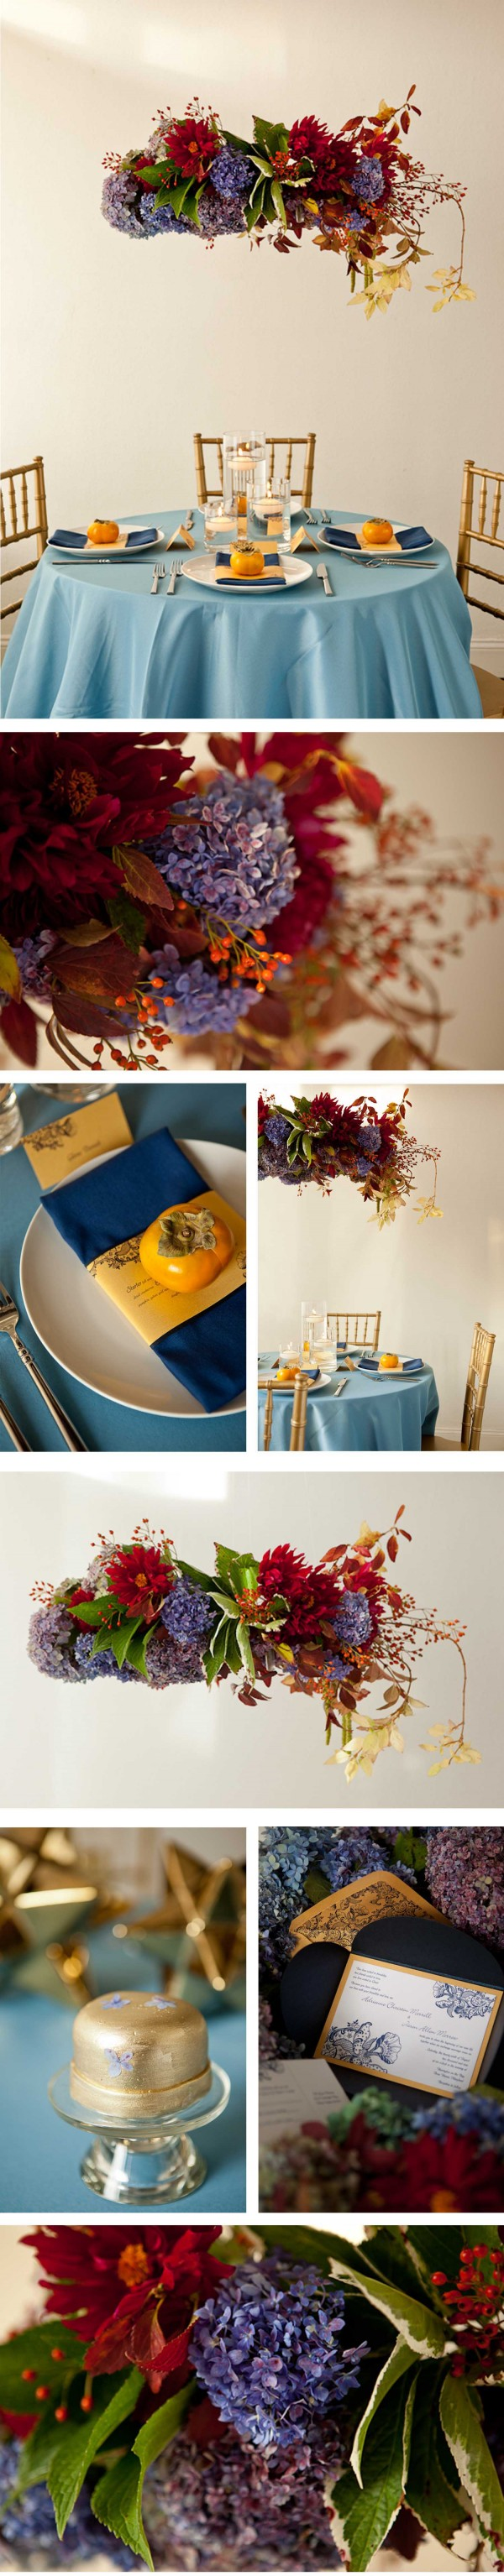 The New Modern: Fall Wreath Table 1